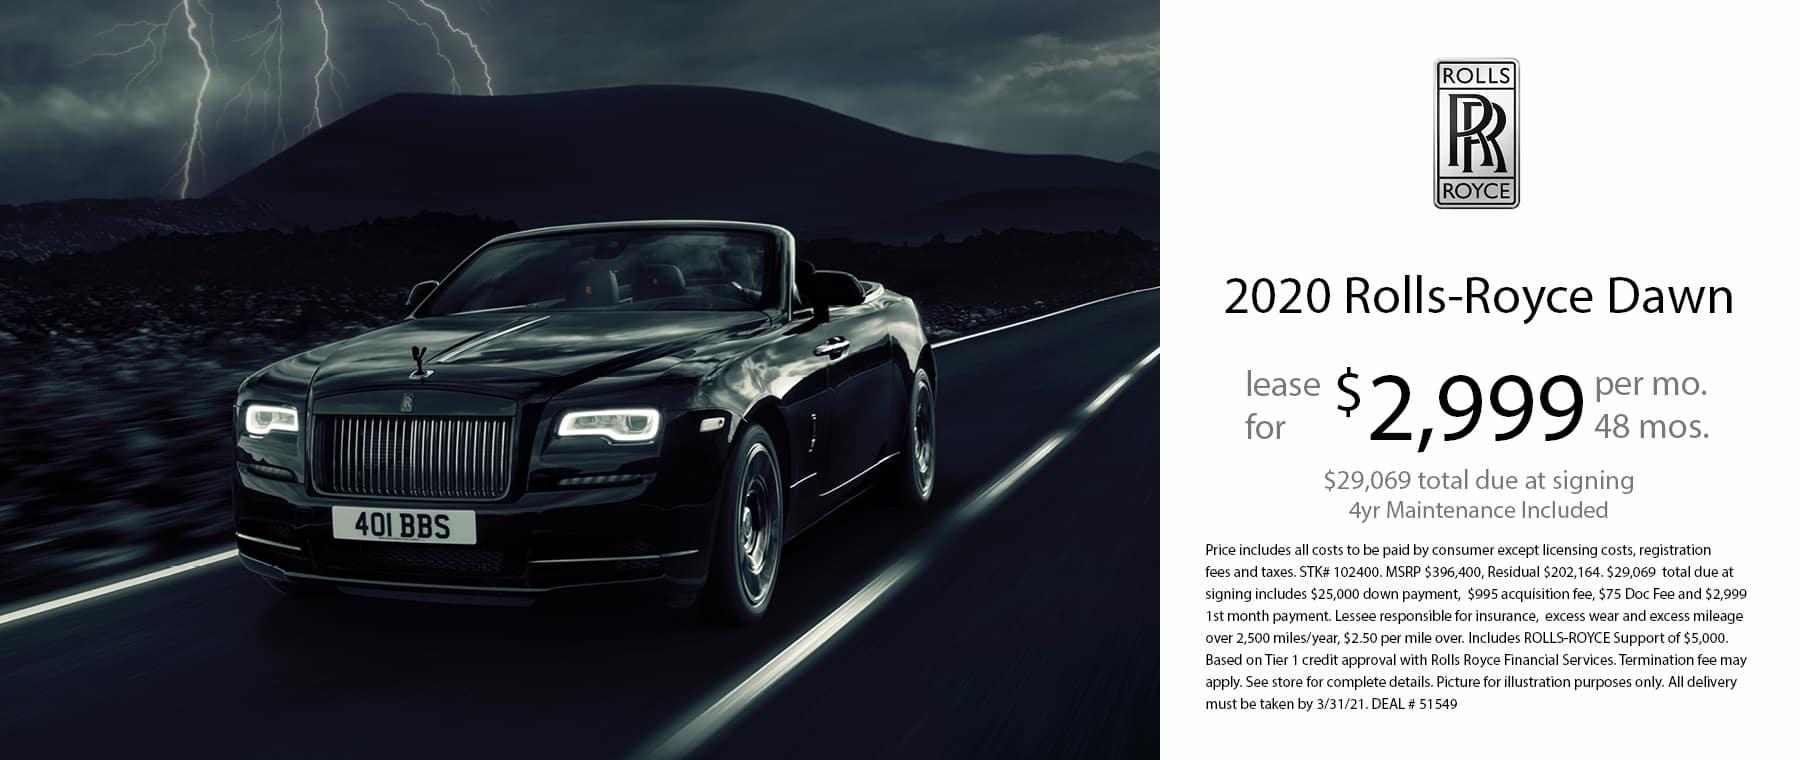 MMC Exotics Rolls Royce 1800v760 January 2021